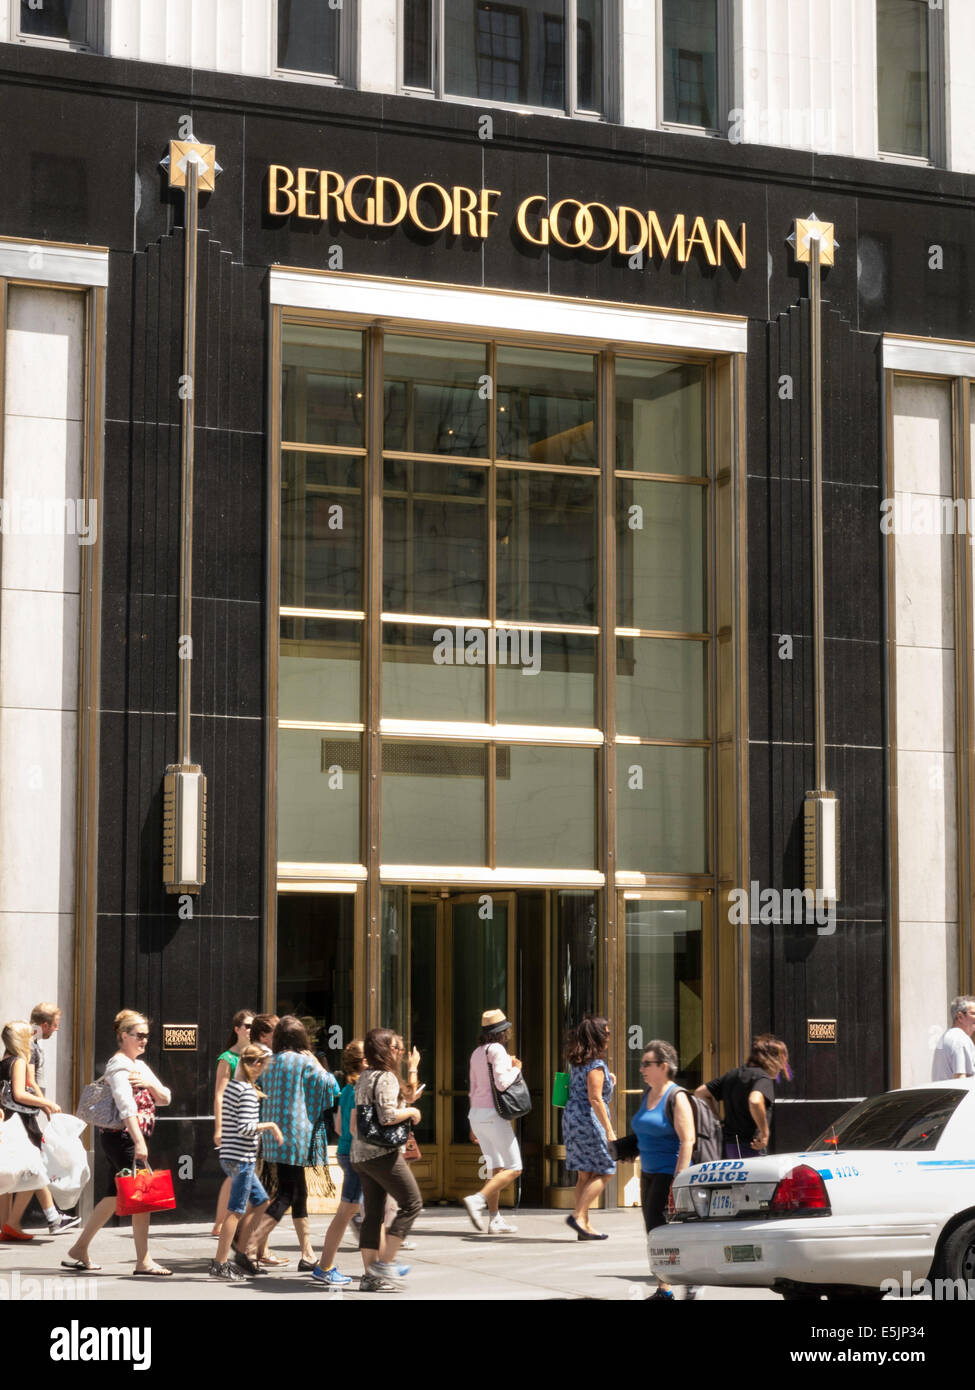 97fbf47d2 Bergdorf Goodman Men's Store, NYC Stock Photo: 72327224 - Alamy